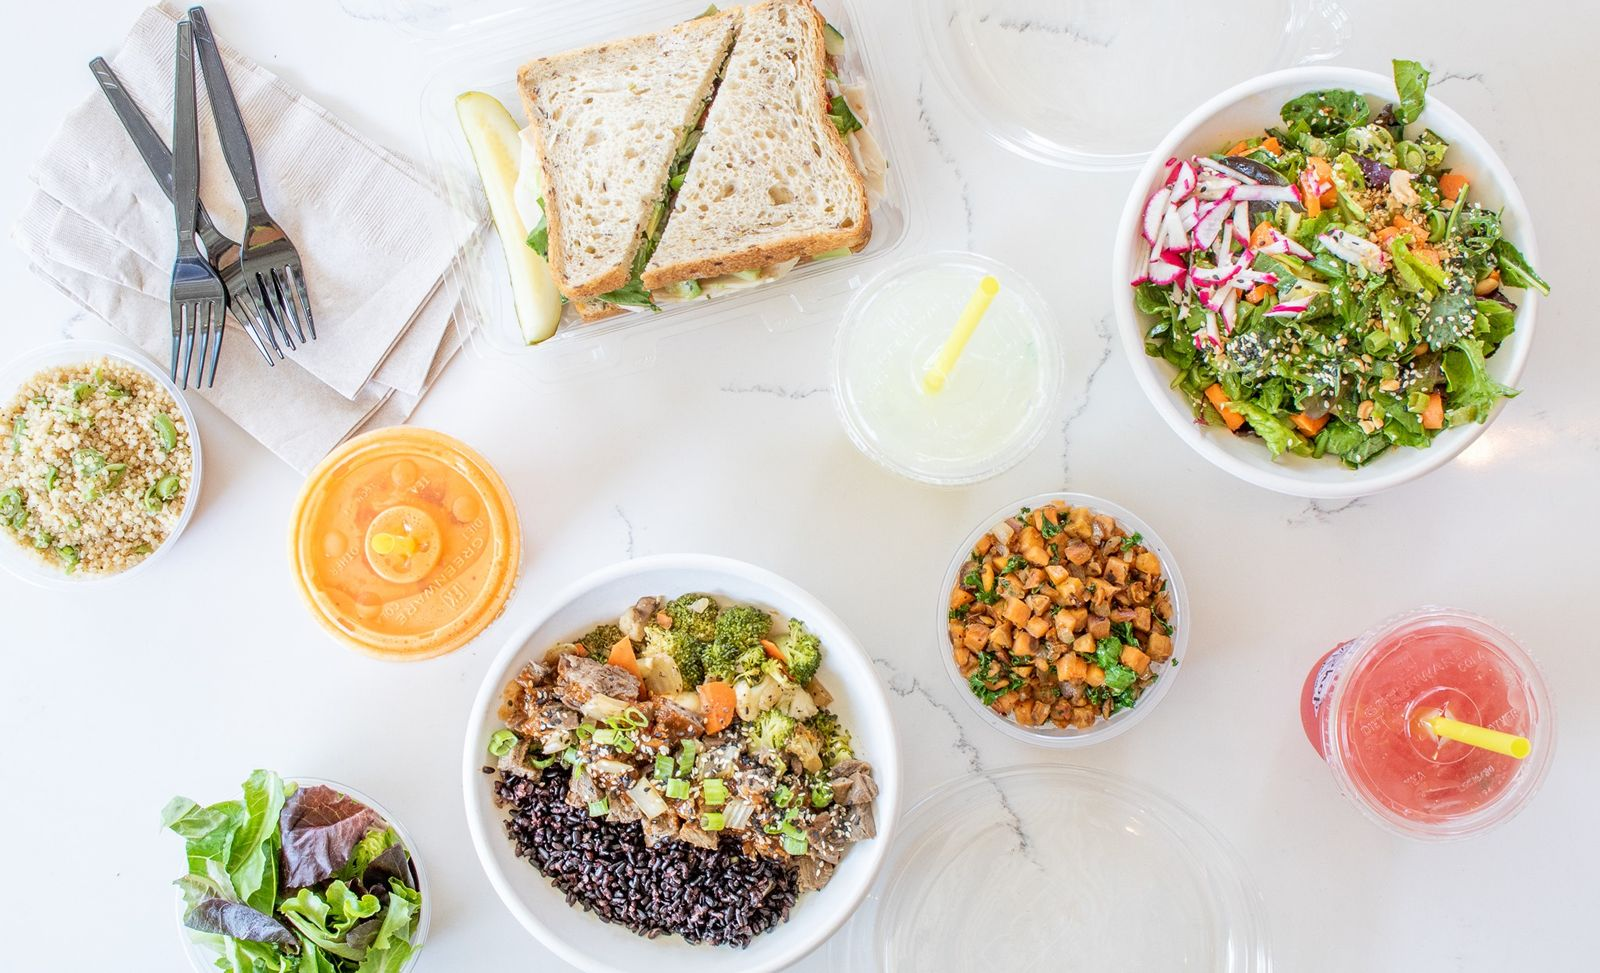 Original ChopShop is Bringing 'Just Feel Good Food' to McKinney